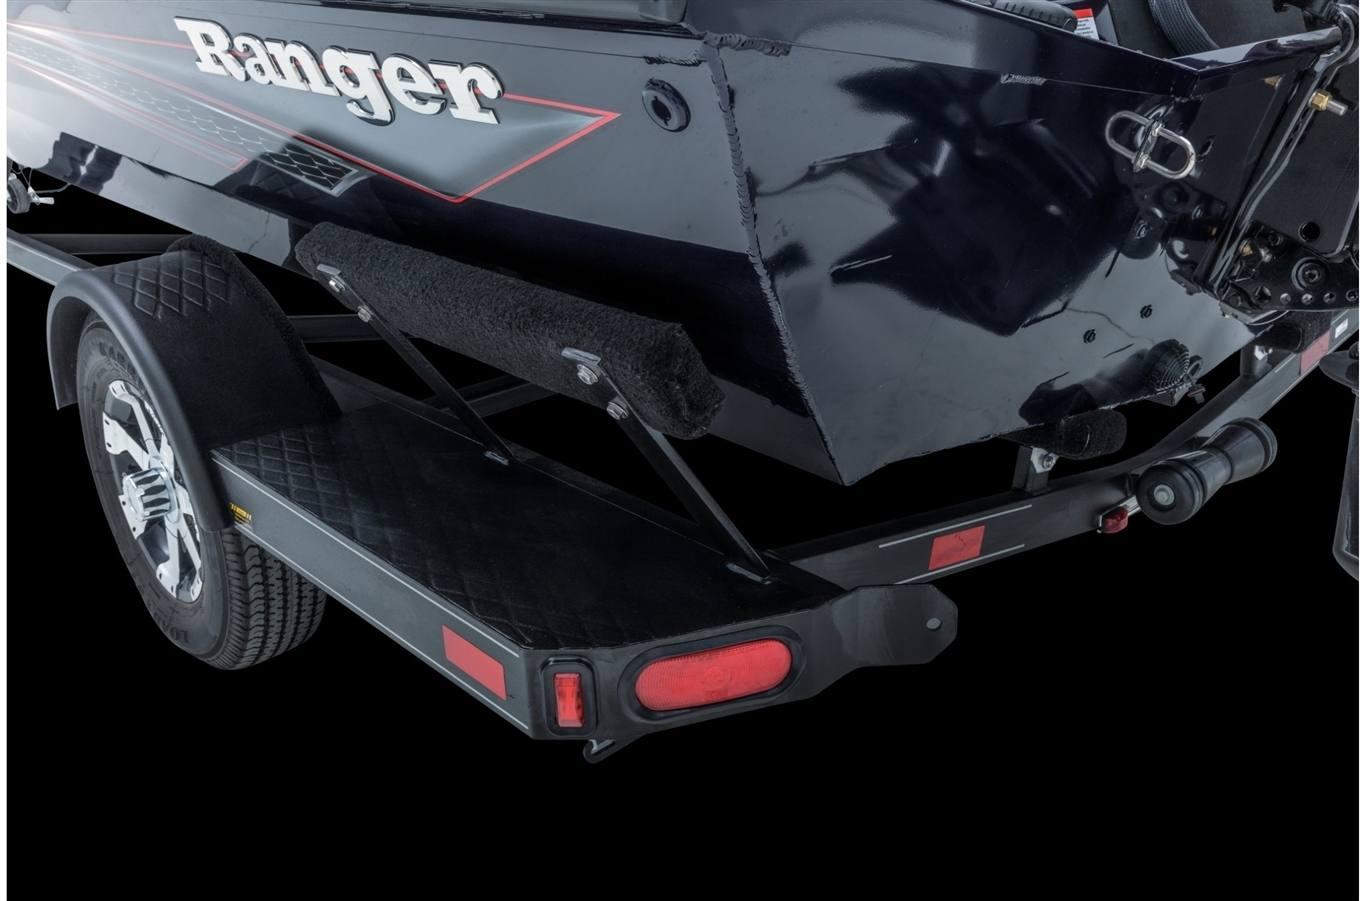 2019 Ranger RT178 for sale in Calvert City, KY  Jet-A-Marina